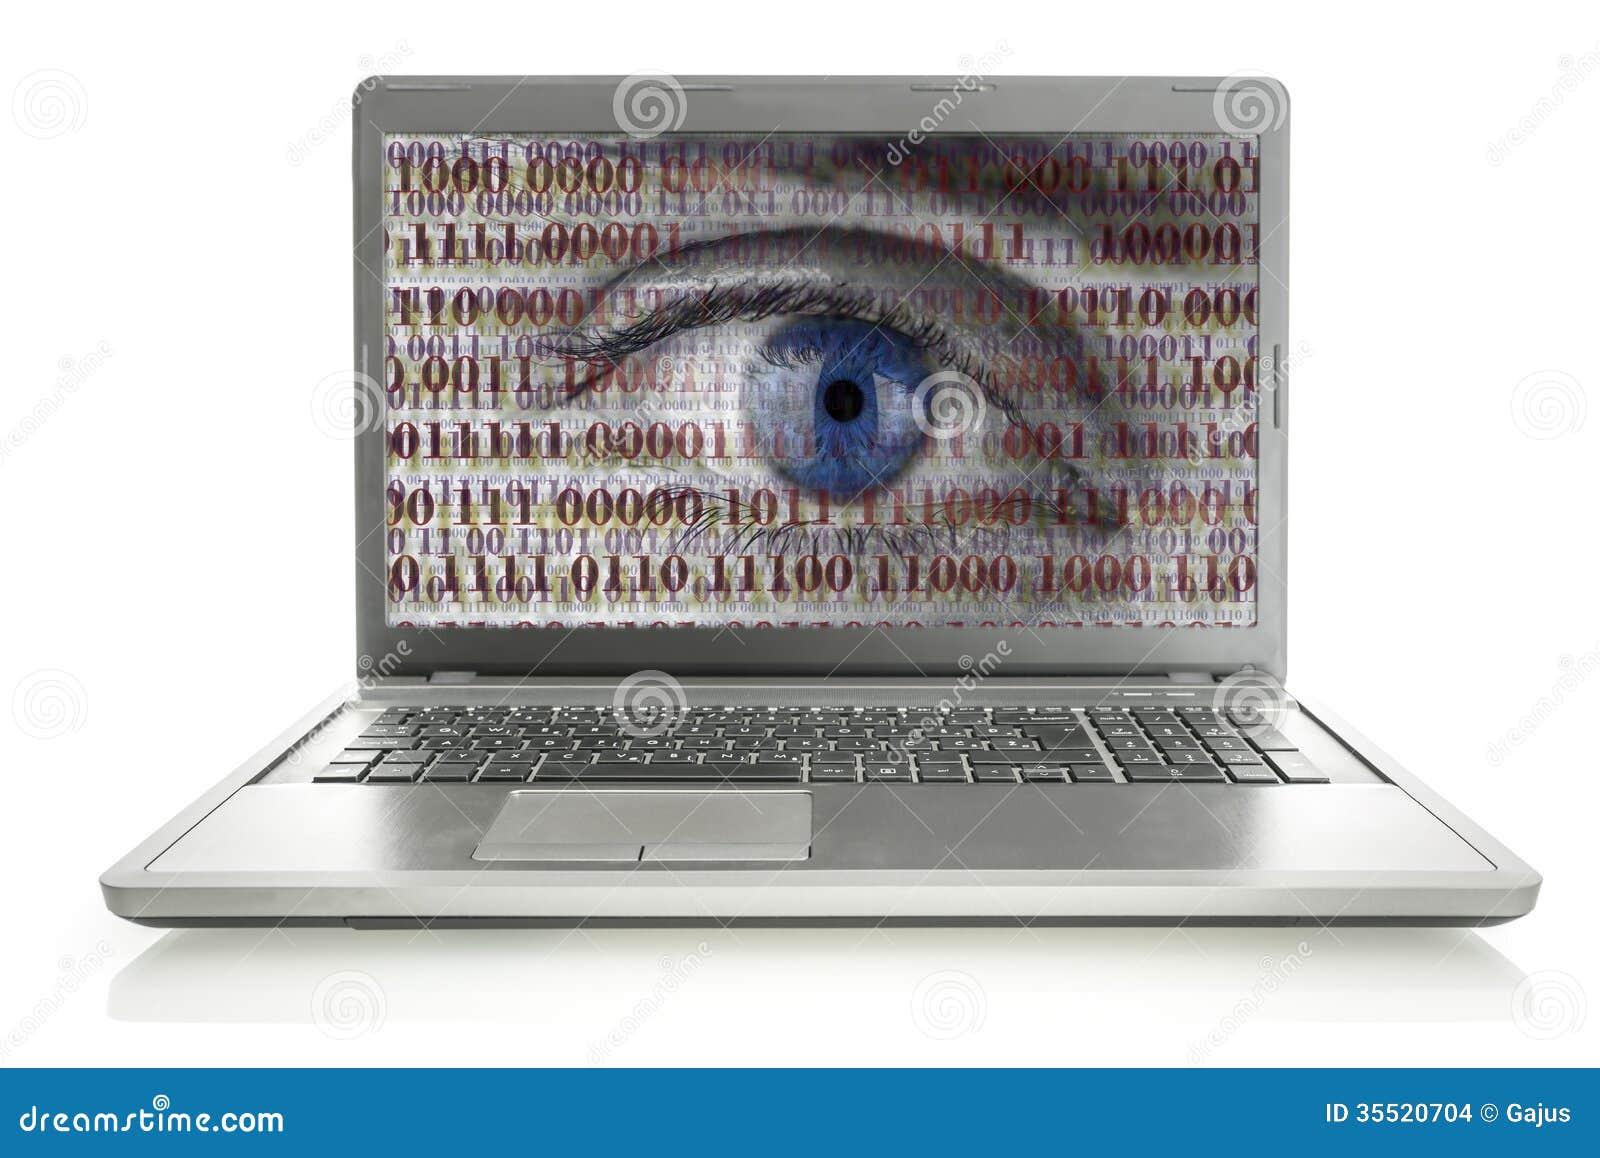 Internetspion